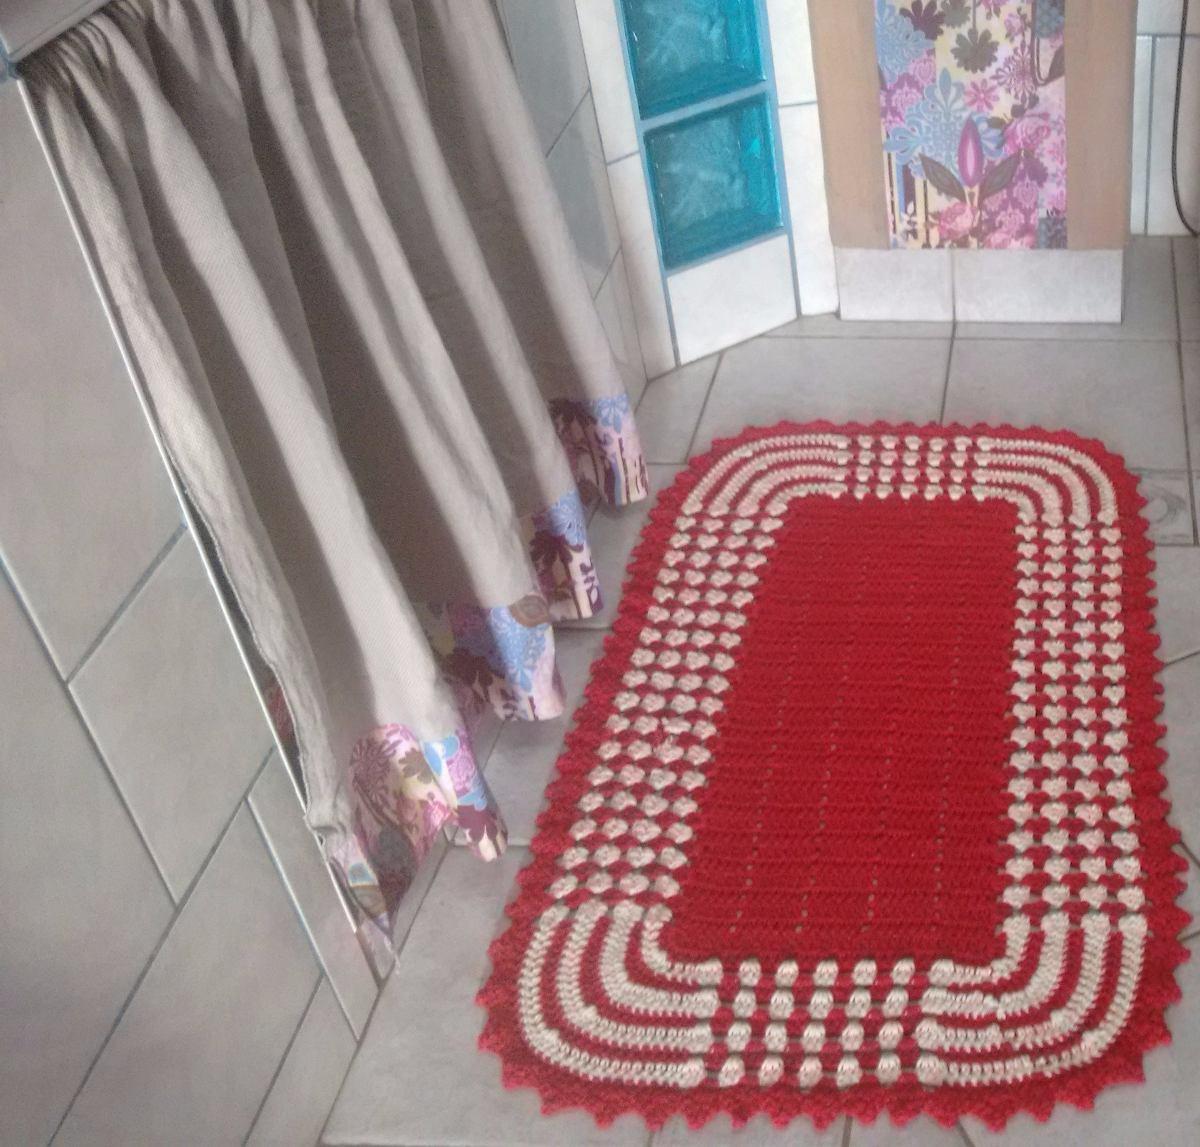 tapetes para quarto retangular cor roxa